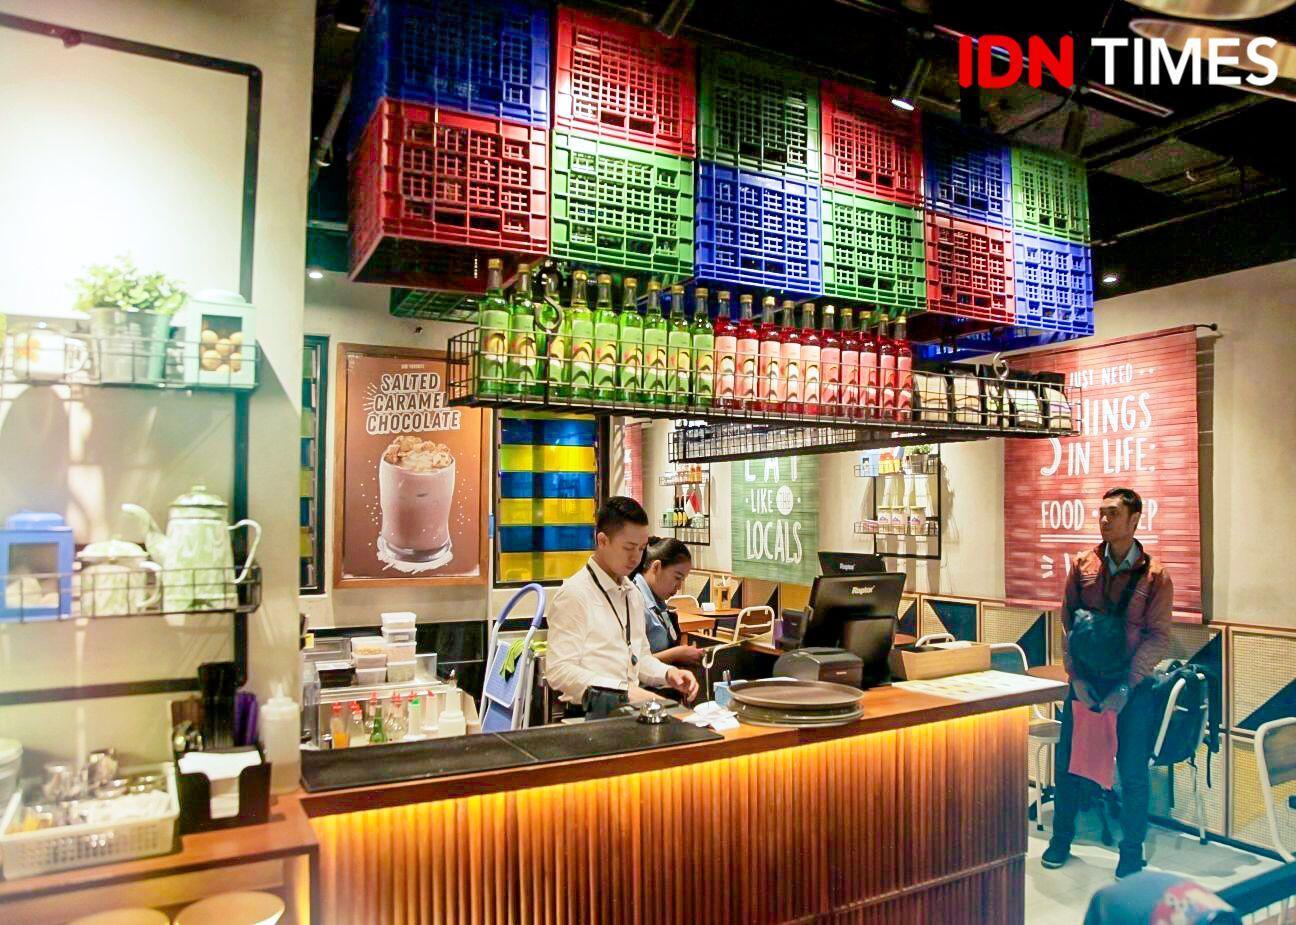 12 Potret The People's Café, Tempat Nongkrong Asyik dan Seru Abis!